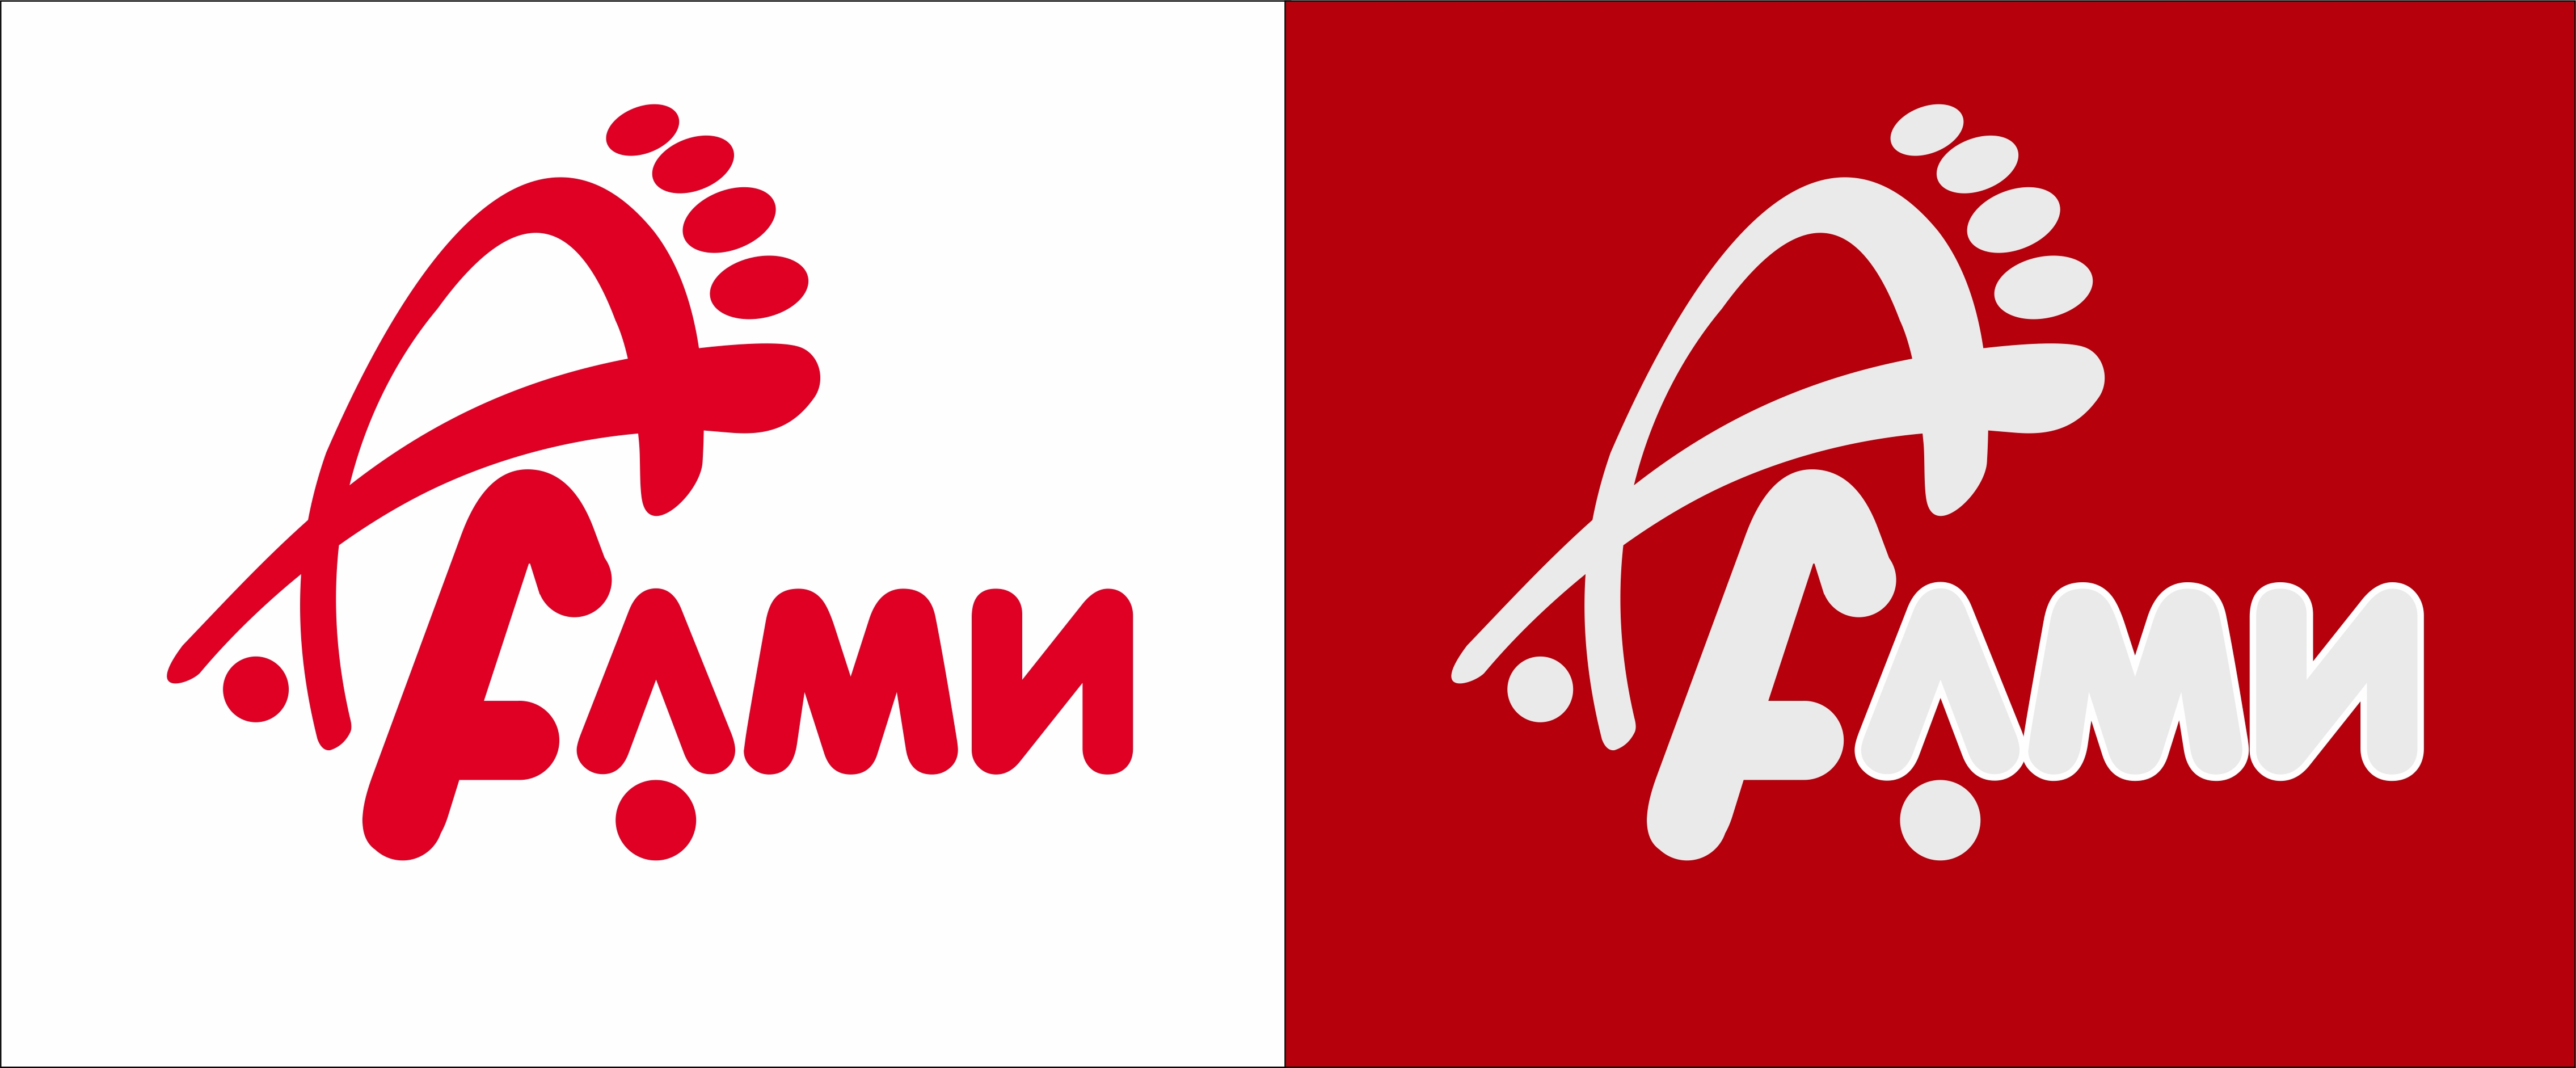 Дизайн логотипа обувной марки Алми фото f_92059e258d7d641b.jpg